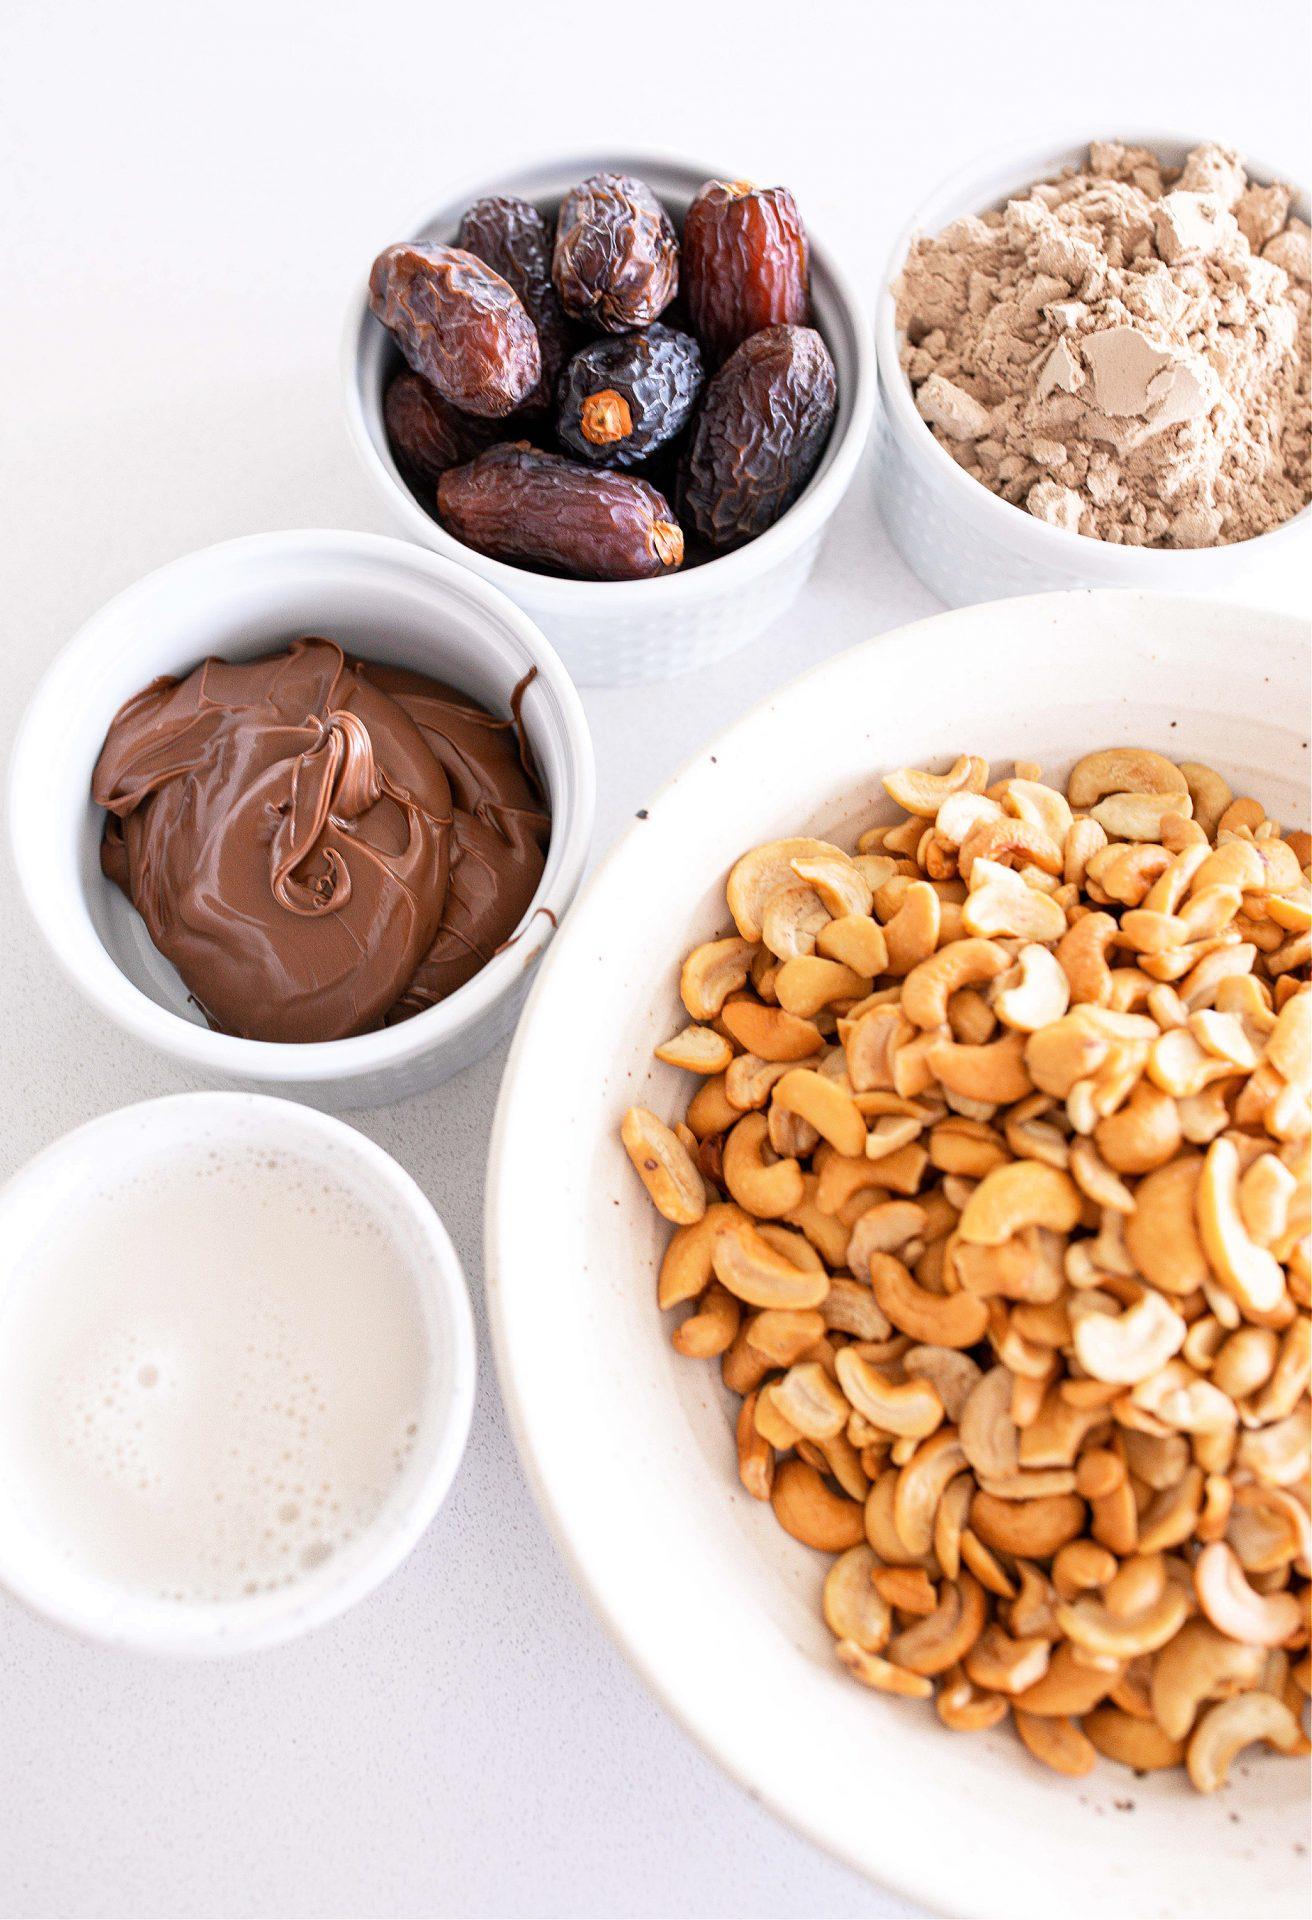 nutella, chocolate hazelnut, protein balls, plant based, gluten free, dairy free, grain free, low carb, healthy snack, chocolate, cashews, dates